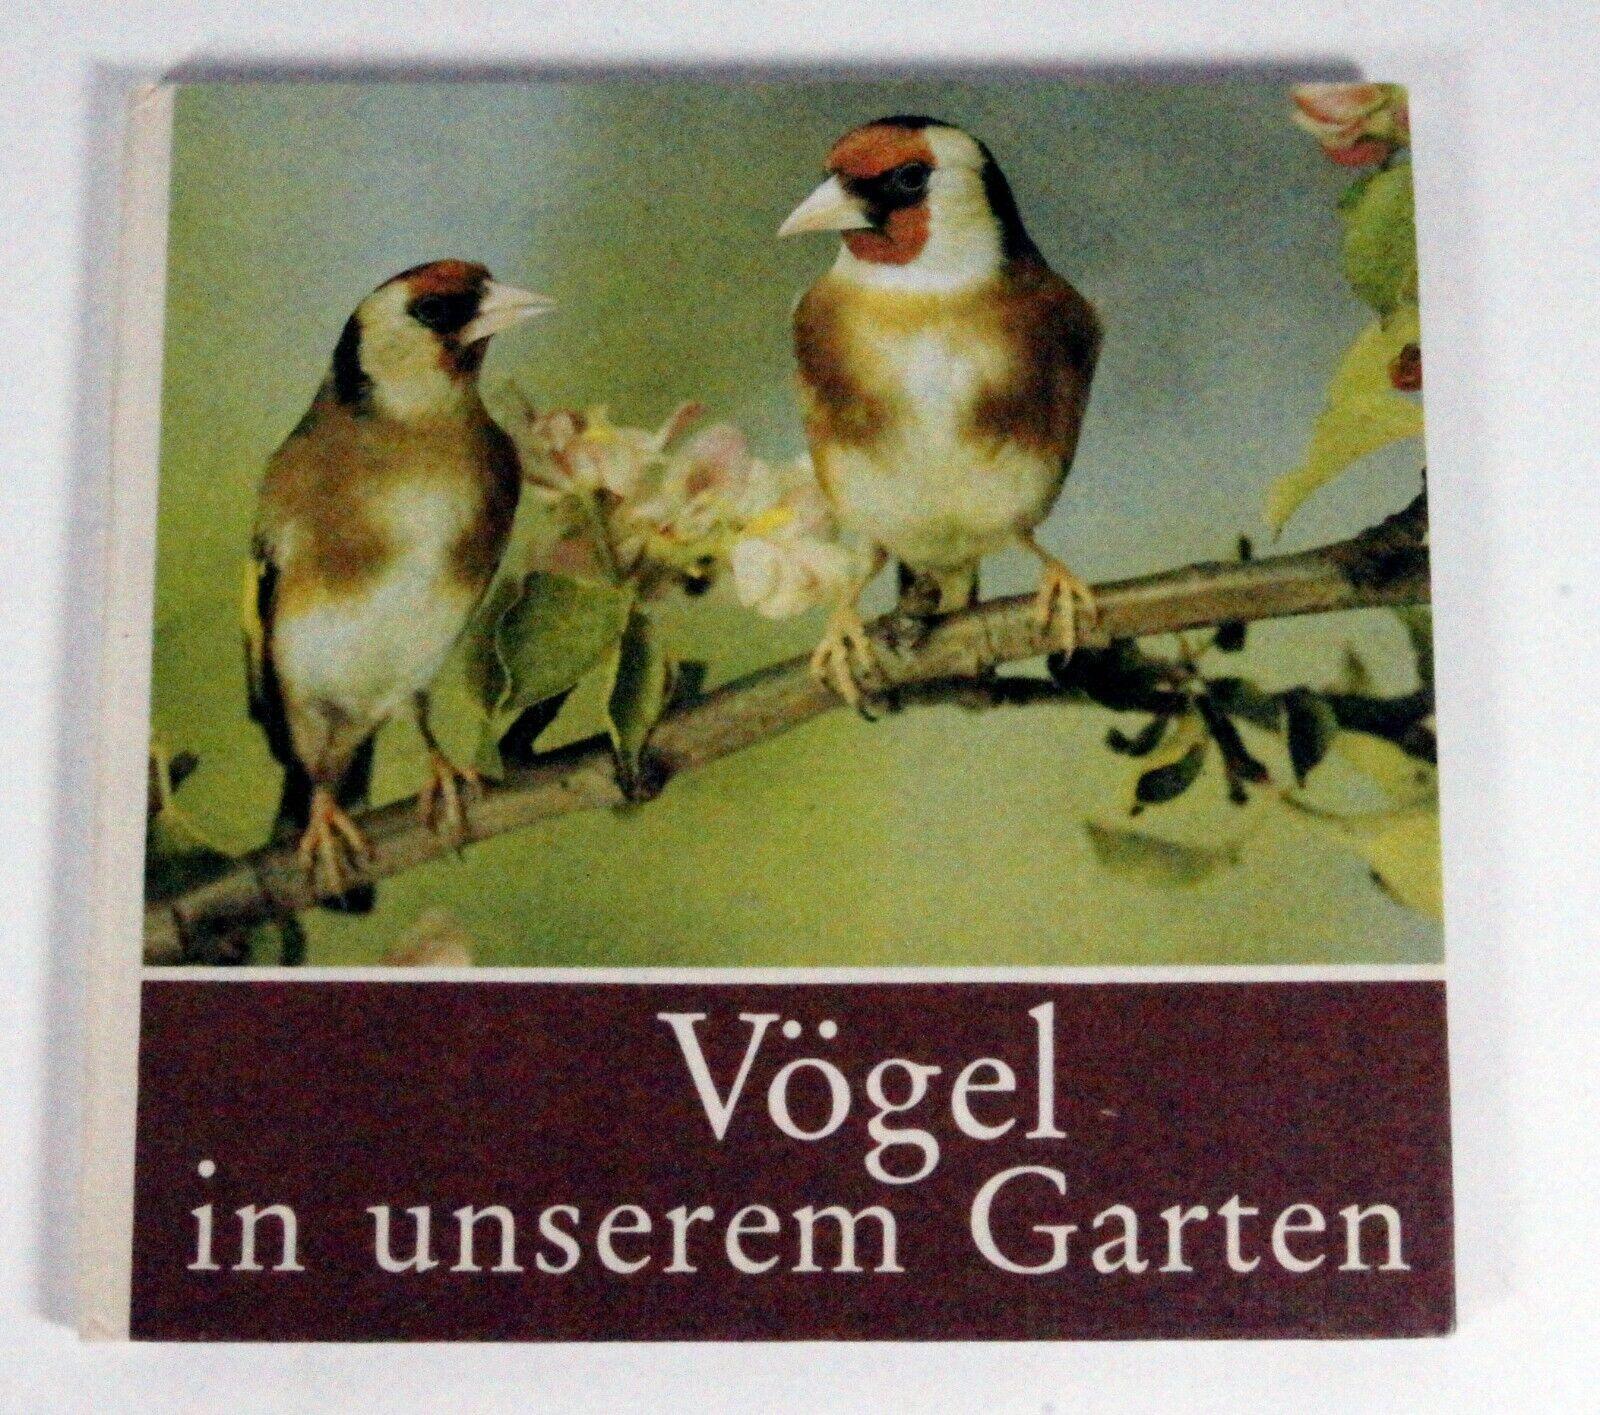 Kinderbuch Vögel in unserem Garten, Buch Kinder, Leipzig Verlag